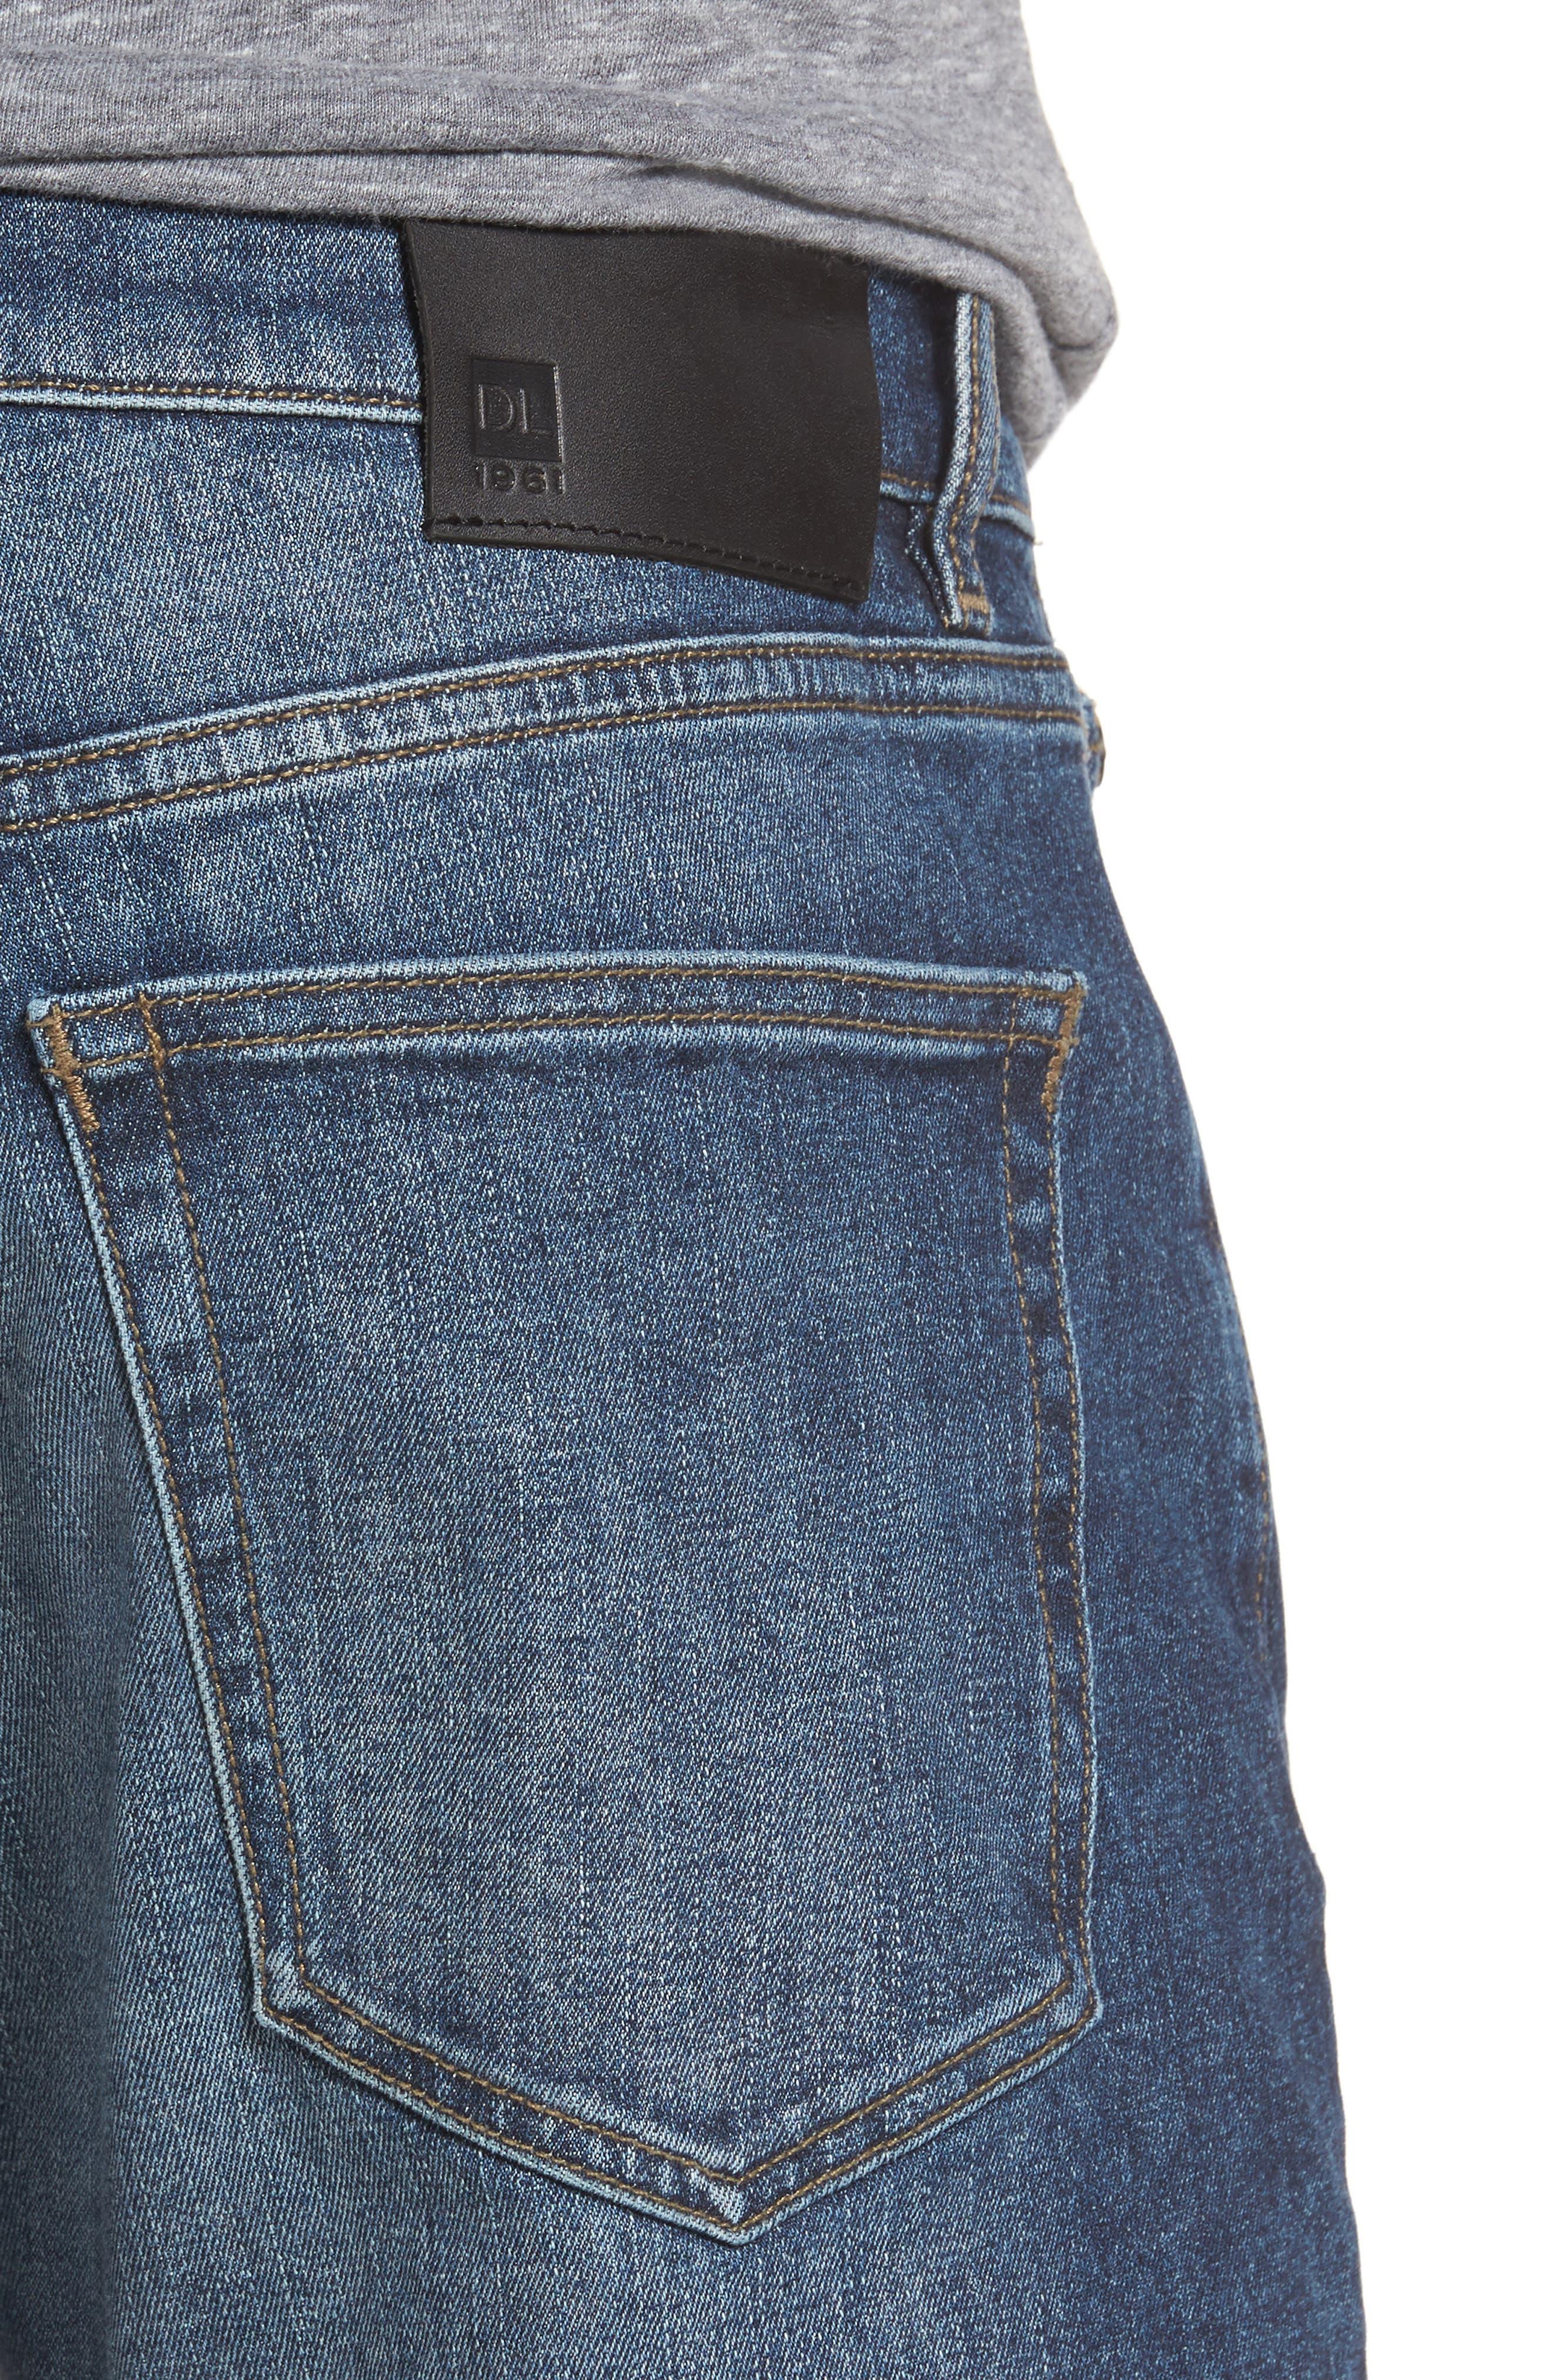 Russell Slim Straight Leg Jeans,                             Alternate thumbnail 4, color,                             405